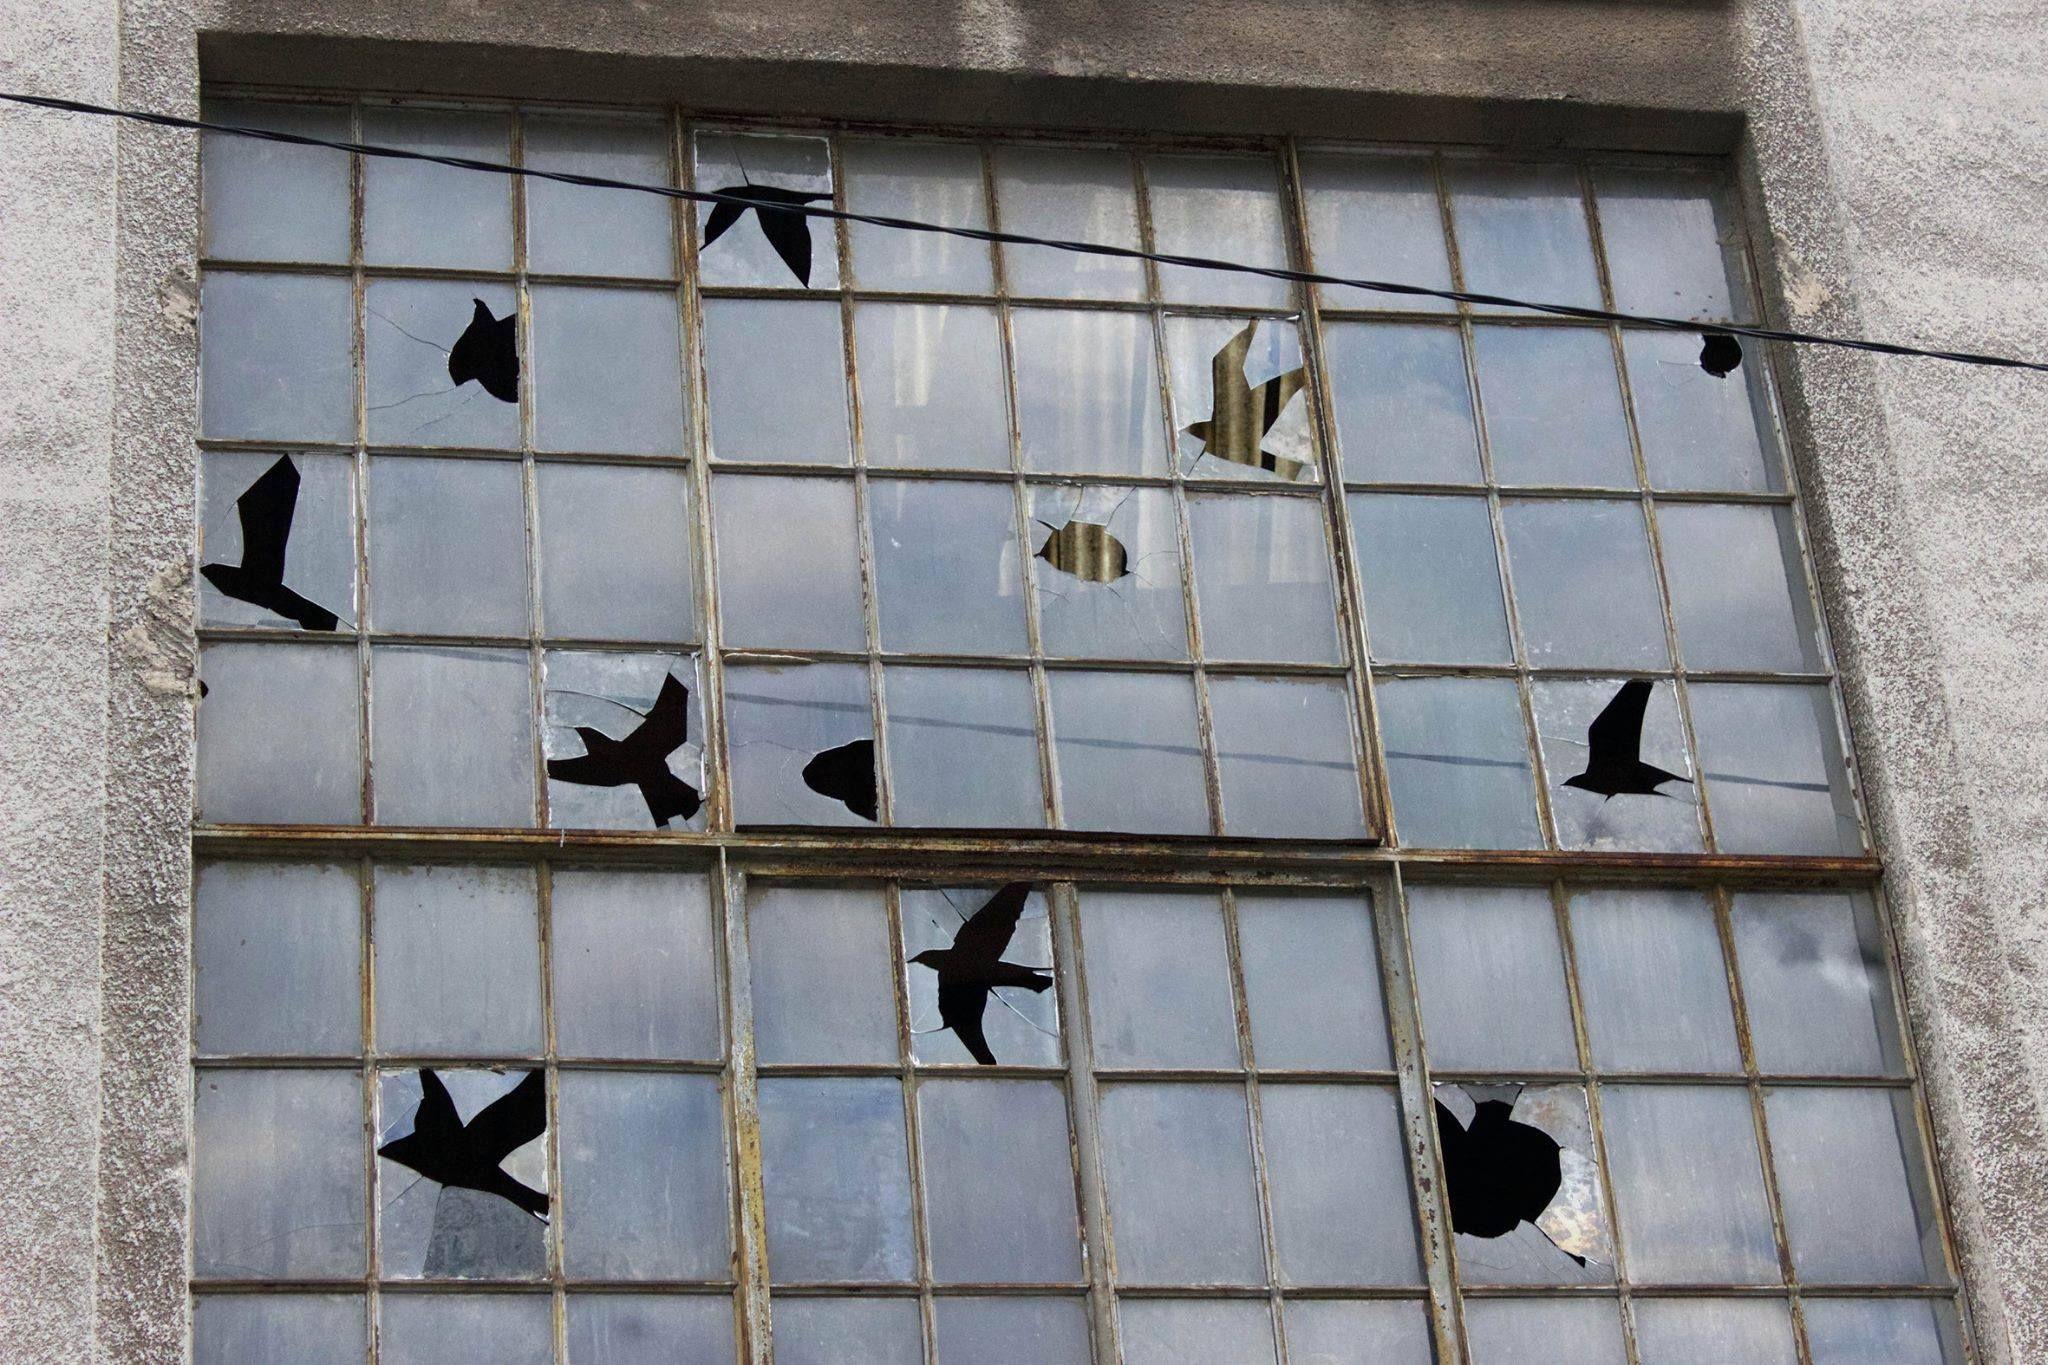 """Camouflage"" - By Pejac in Croatia, Rijeka. Tribute to René Magritte. Photo by Sasha Bogojev."